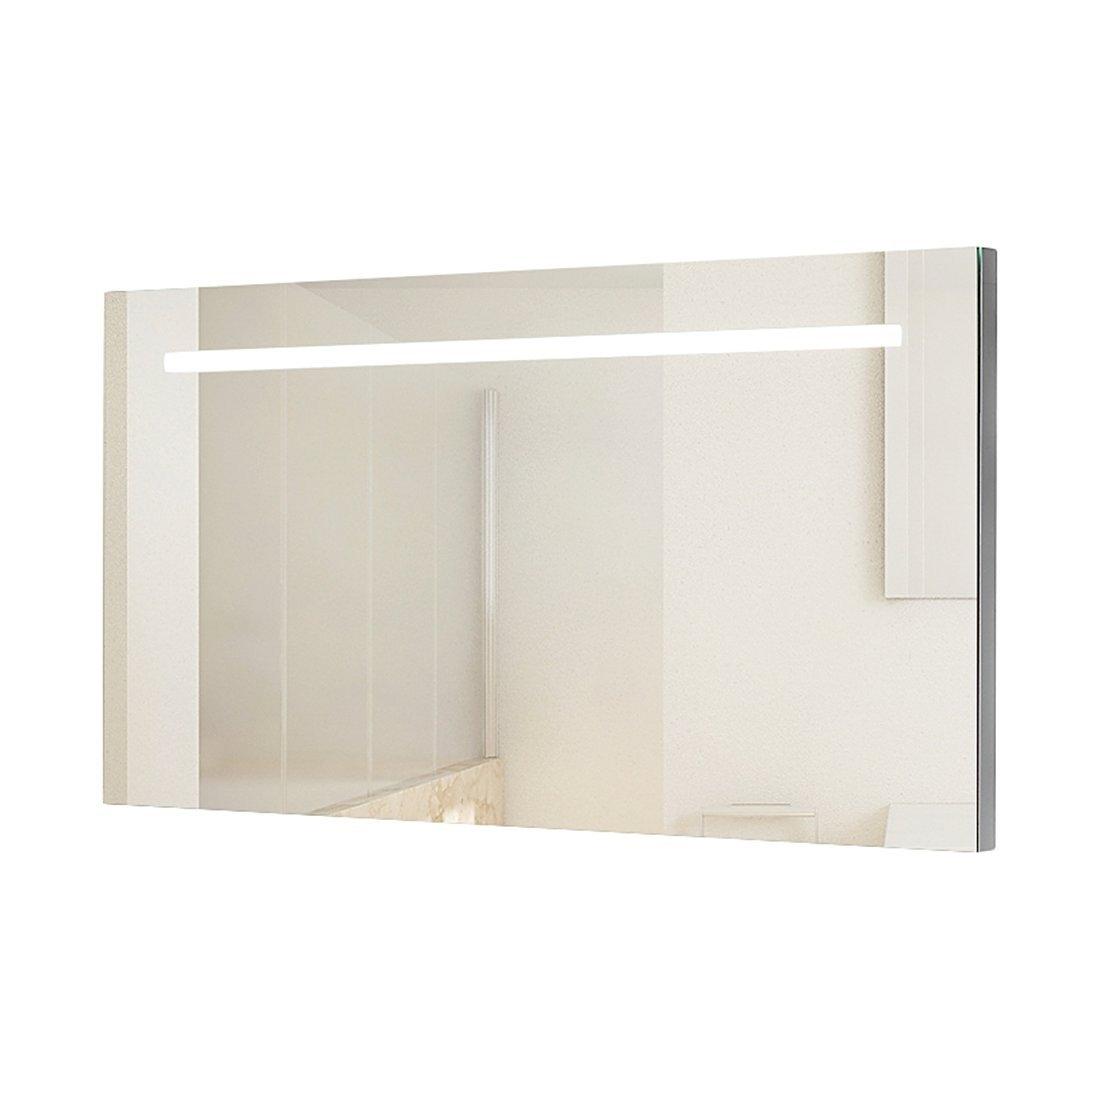 26 Original Large Bathroom Mirrors Uk | eyagci.com